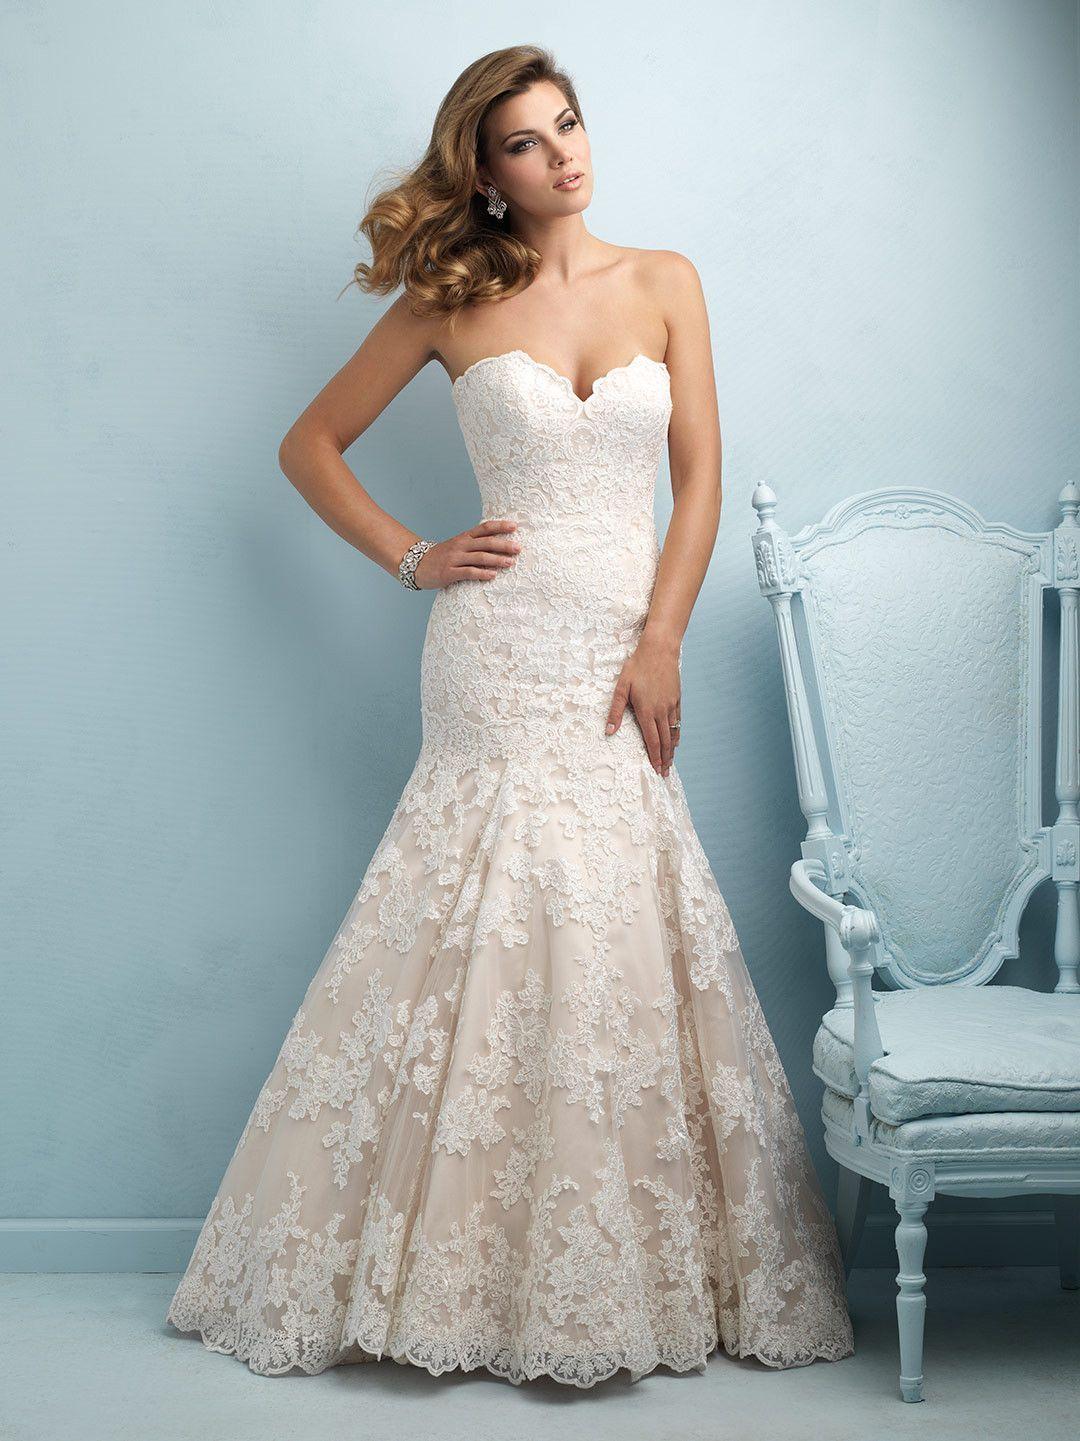 Allure Bridals 9215 Strapless Lace Mermaid Wedding Dress | white ...